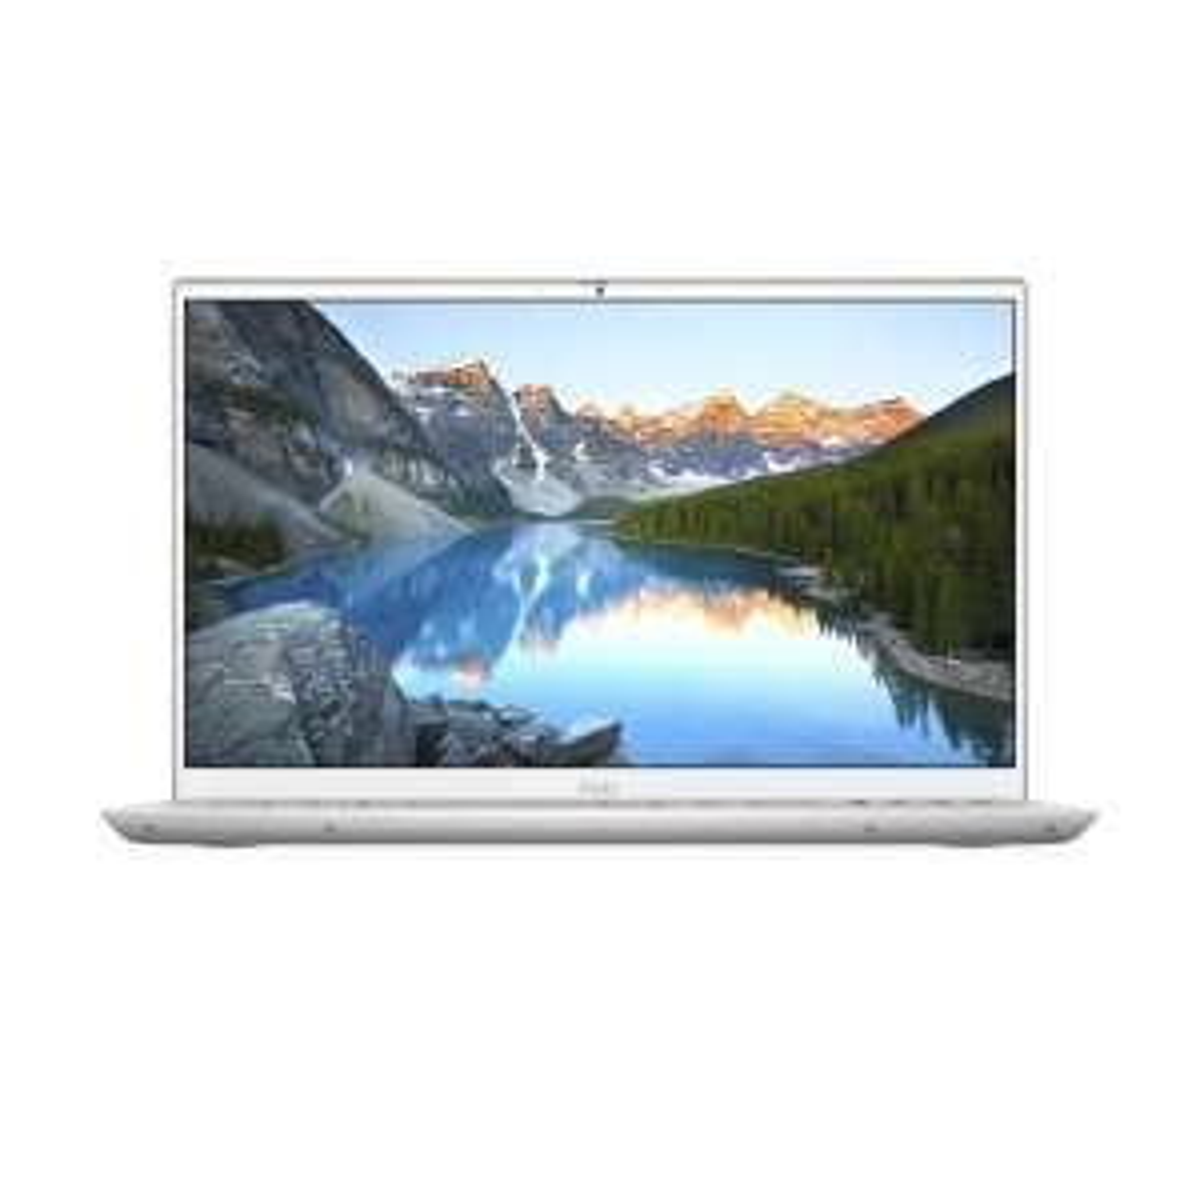 "PC Portable 15.6"" Dell Inspiron 7501-9768 - FHD, i5-10300H, RAM 8 Go, SSD 512 Go, GTX 1650, Windows 10"